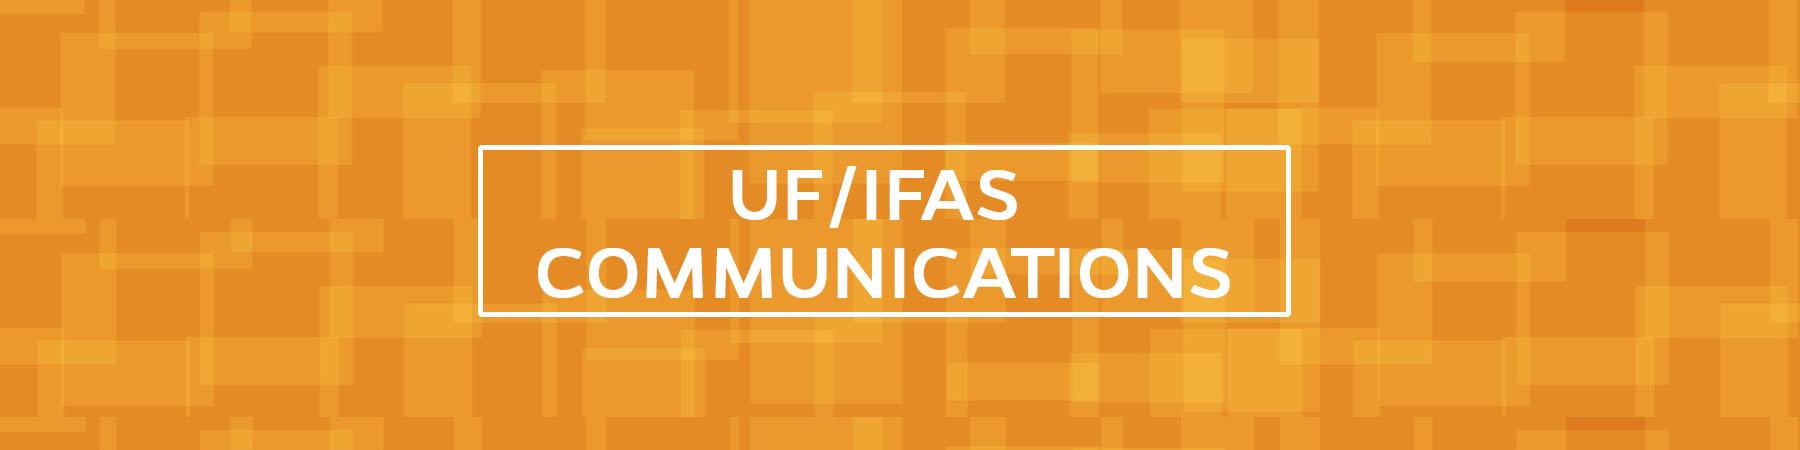 UF IFAS Communications Blog